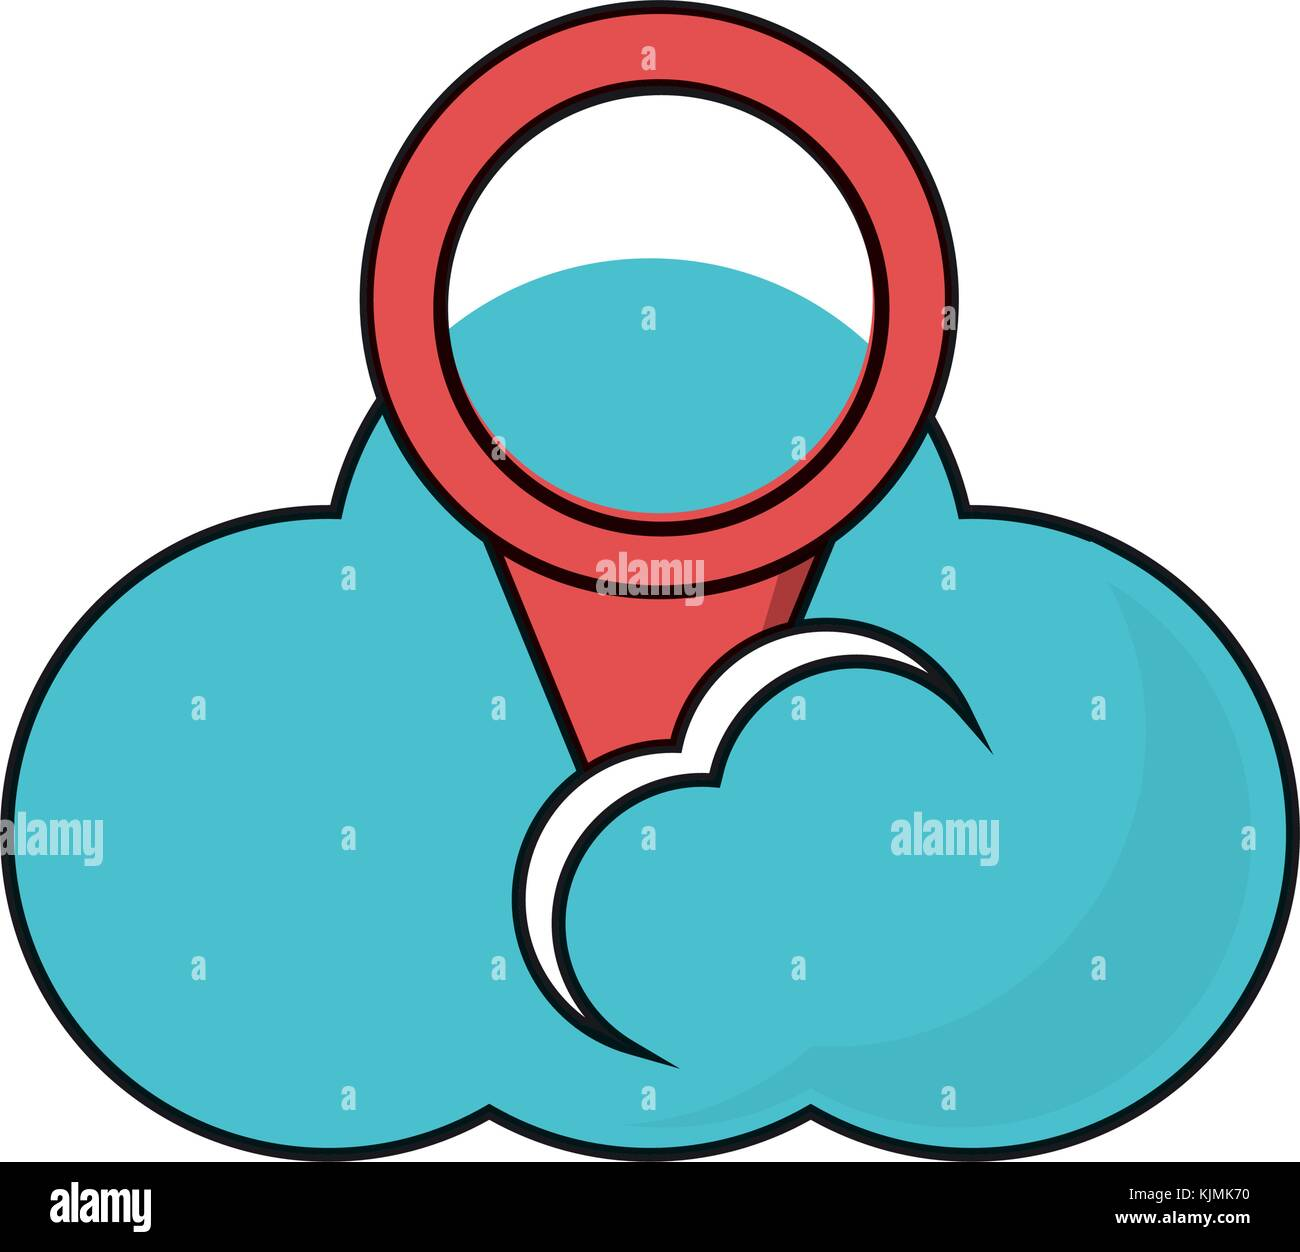 cloud storage design concept - Stock Image